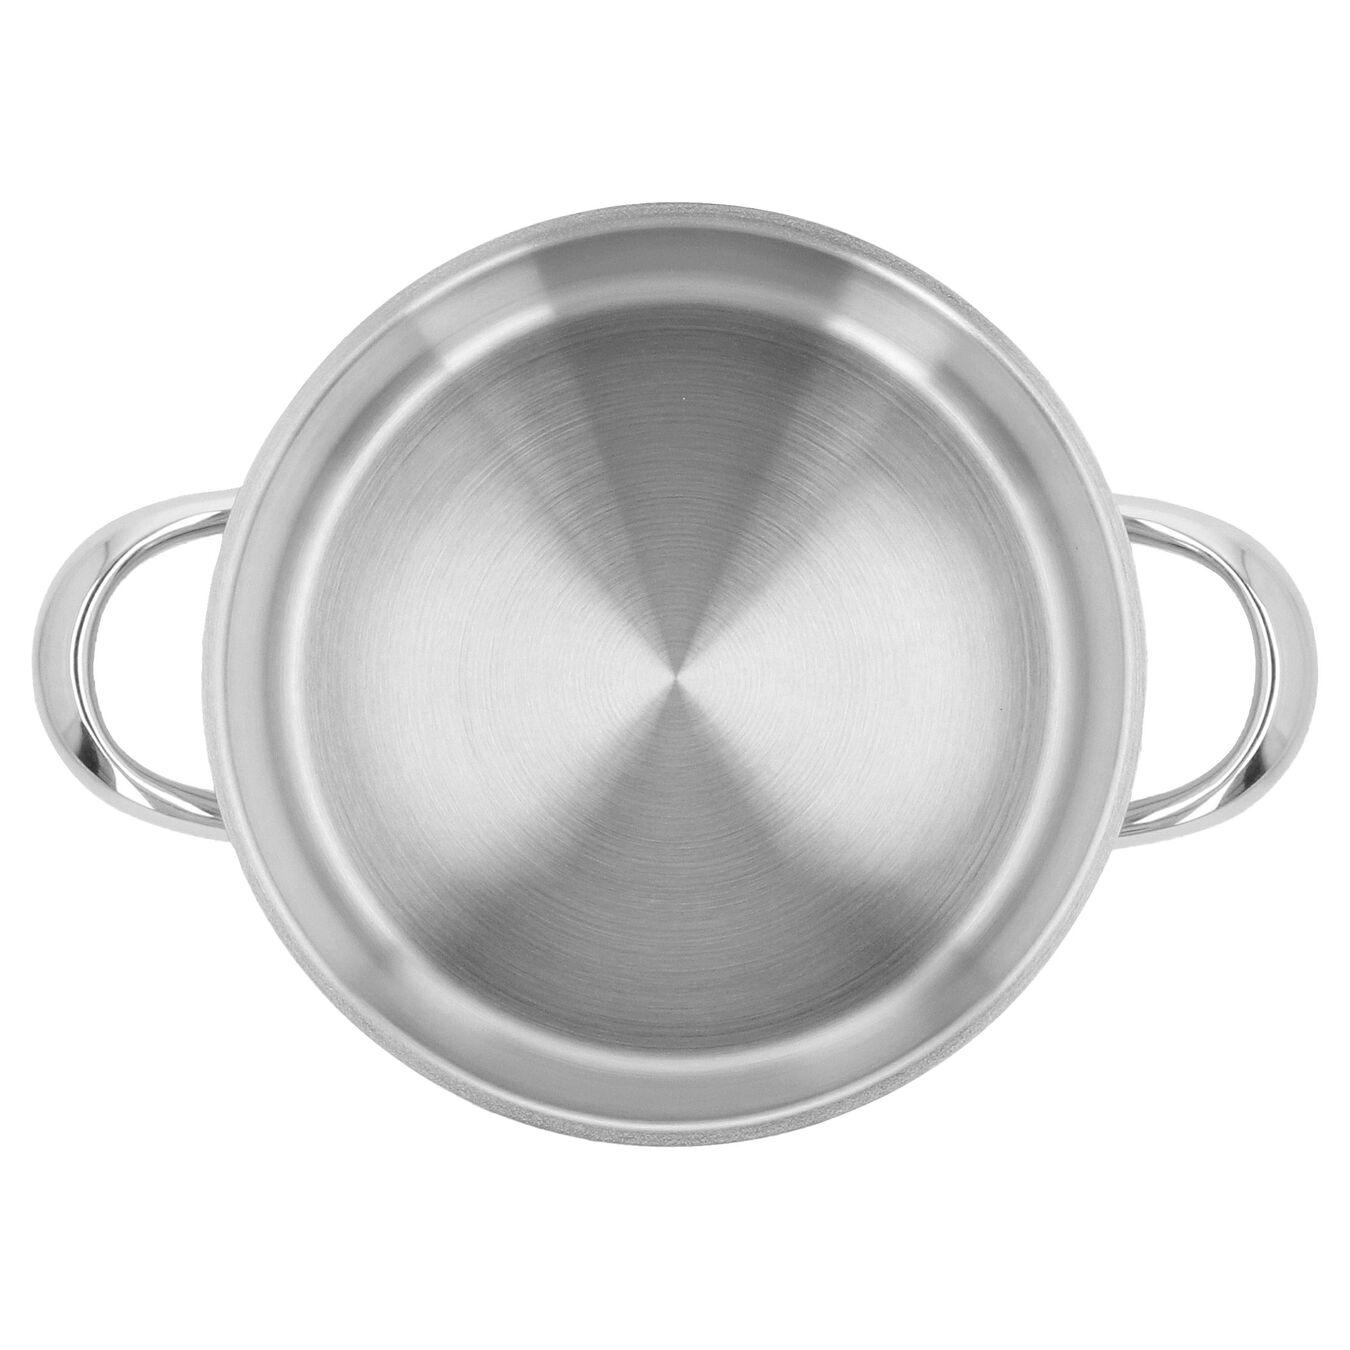 Kookpot met deksel 18 cm / 2,2 l,,large 3